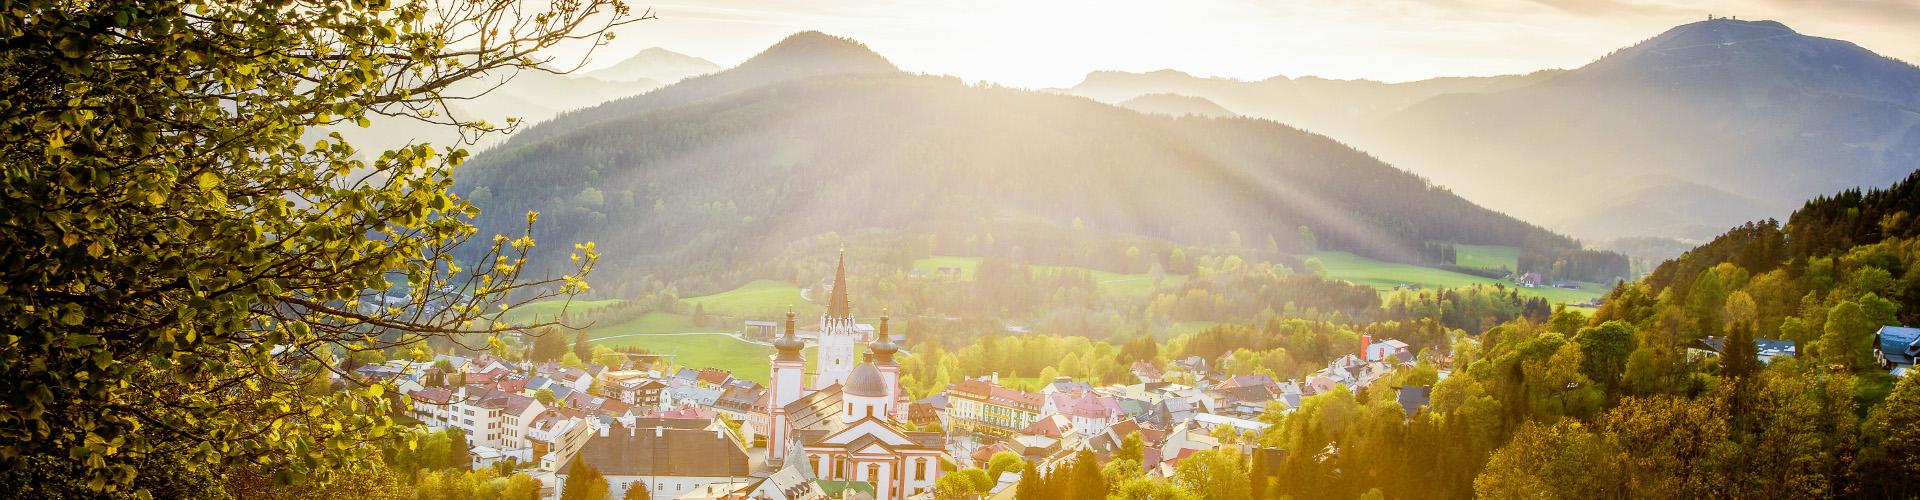 Blick auf Mariazell im Frühling, © www.mariazell.blog